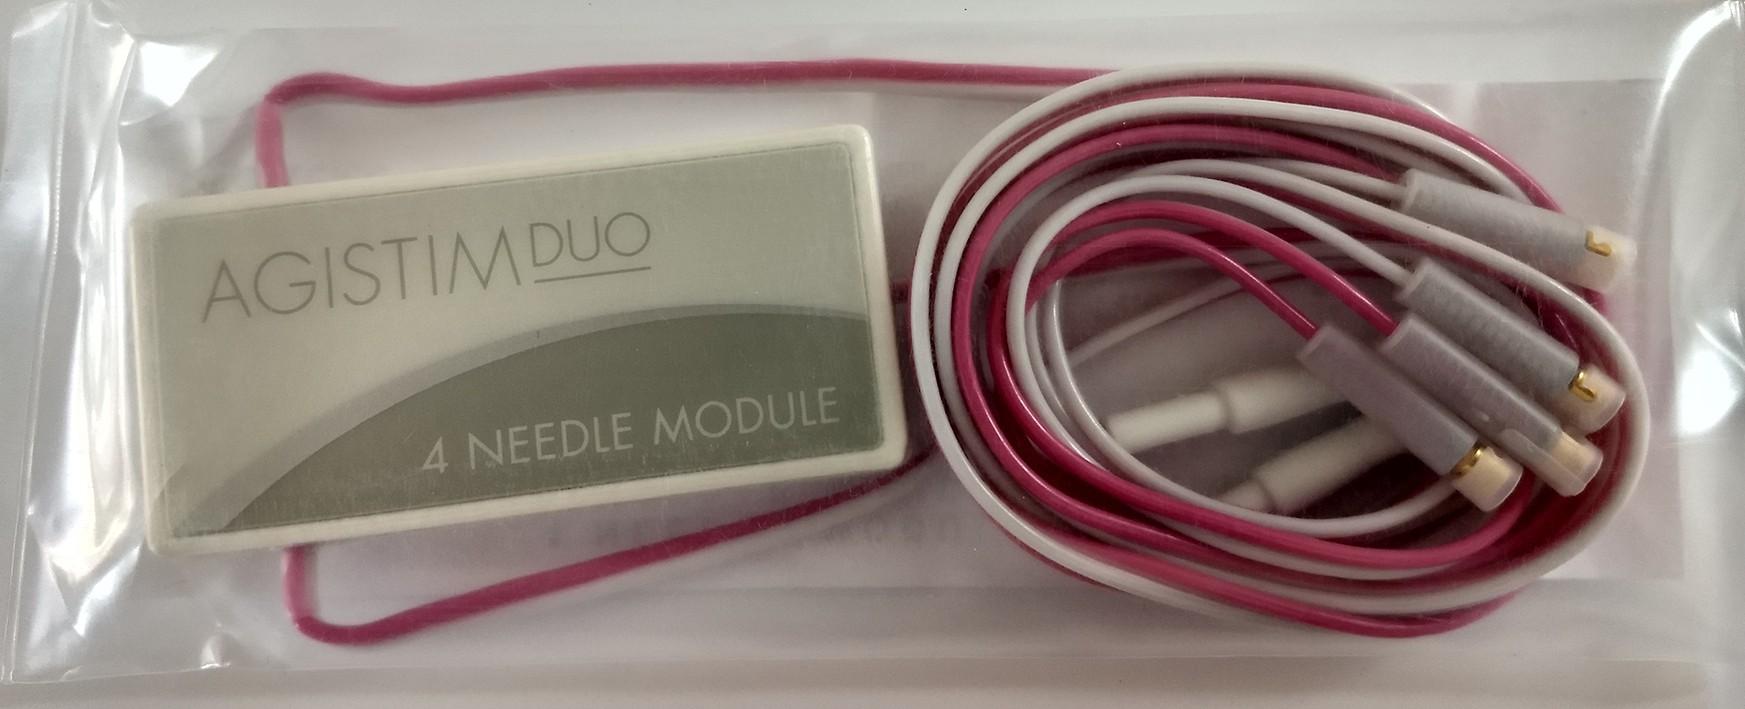 4 NEEDLE MODULE  ROSE-AGIDUO-032